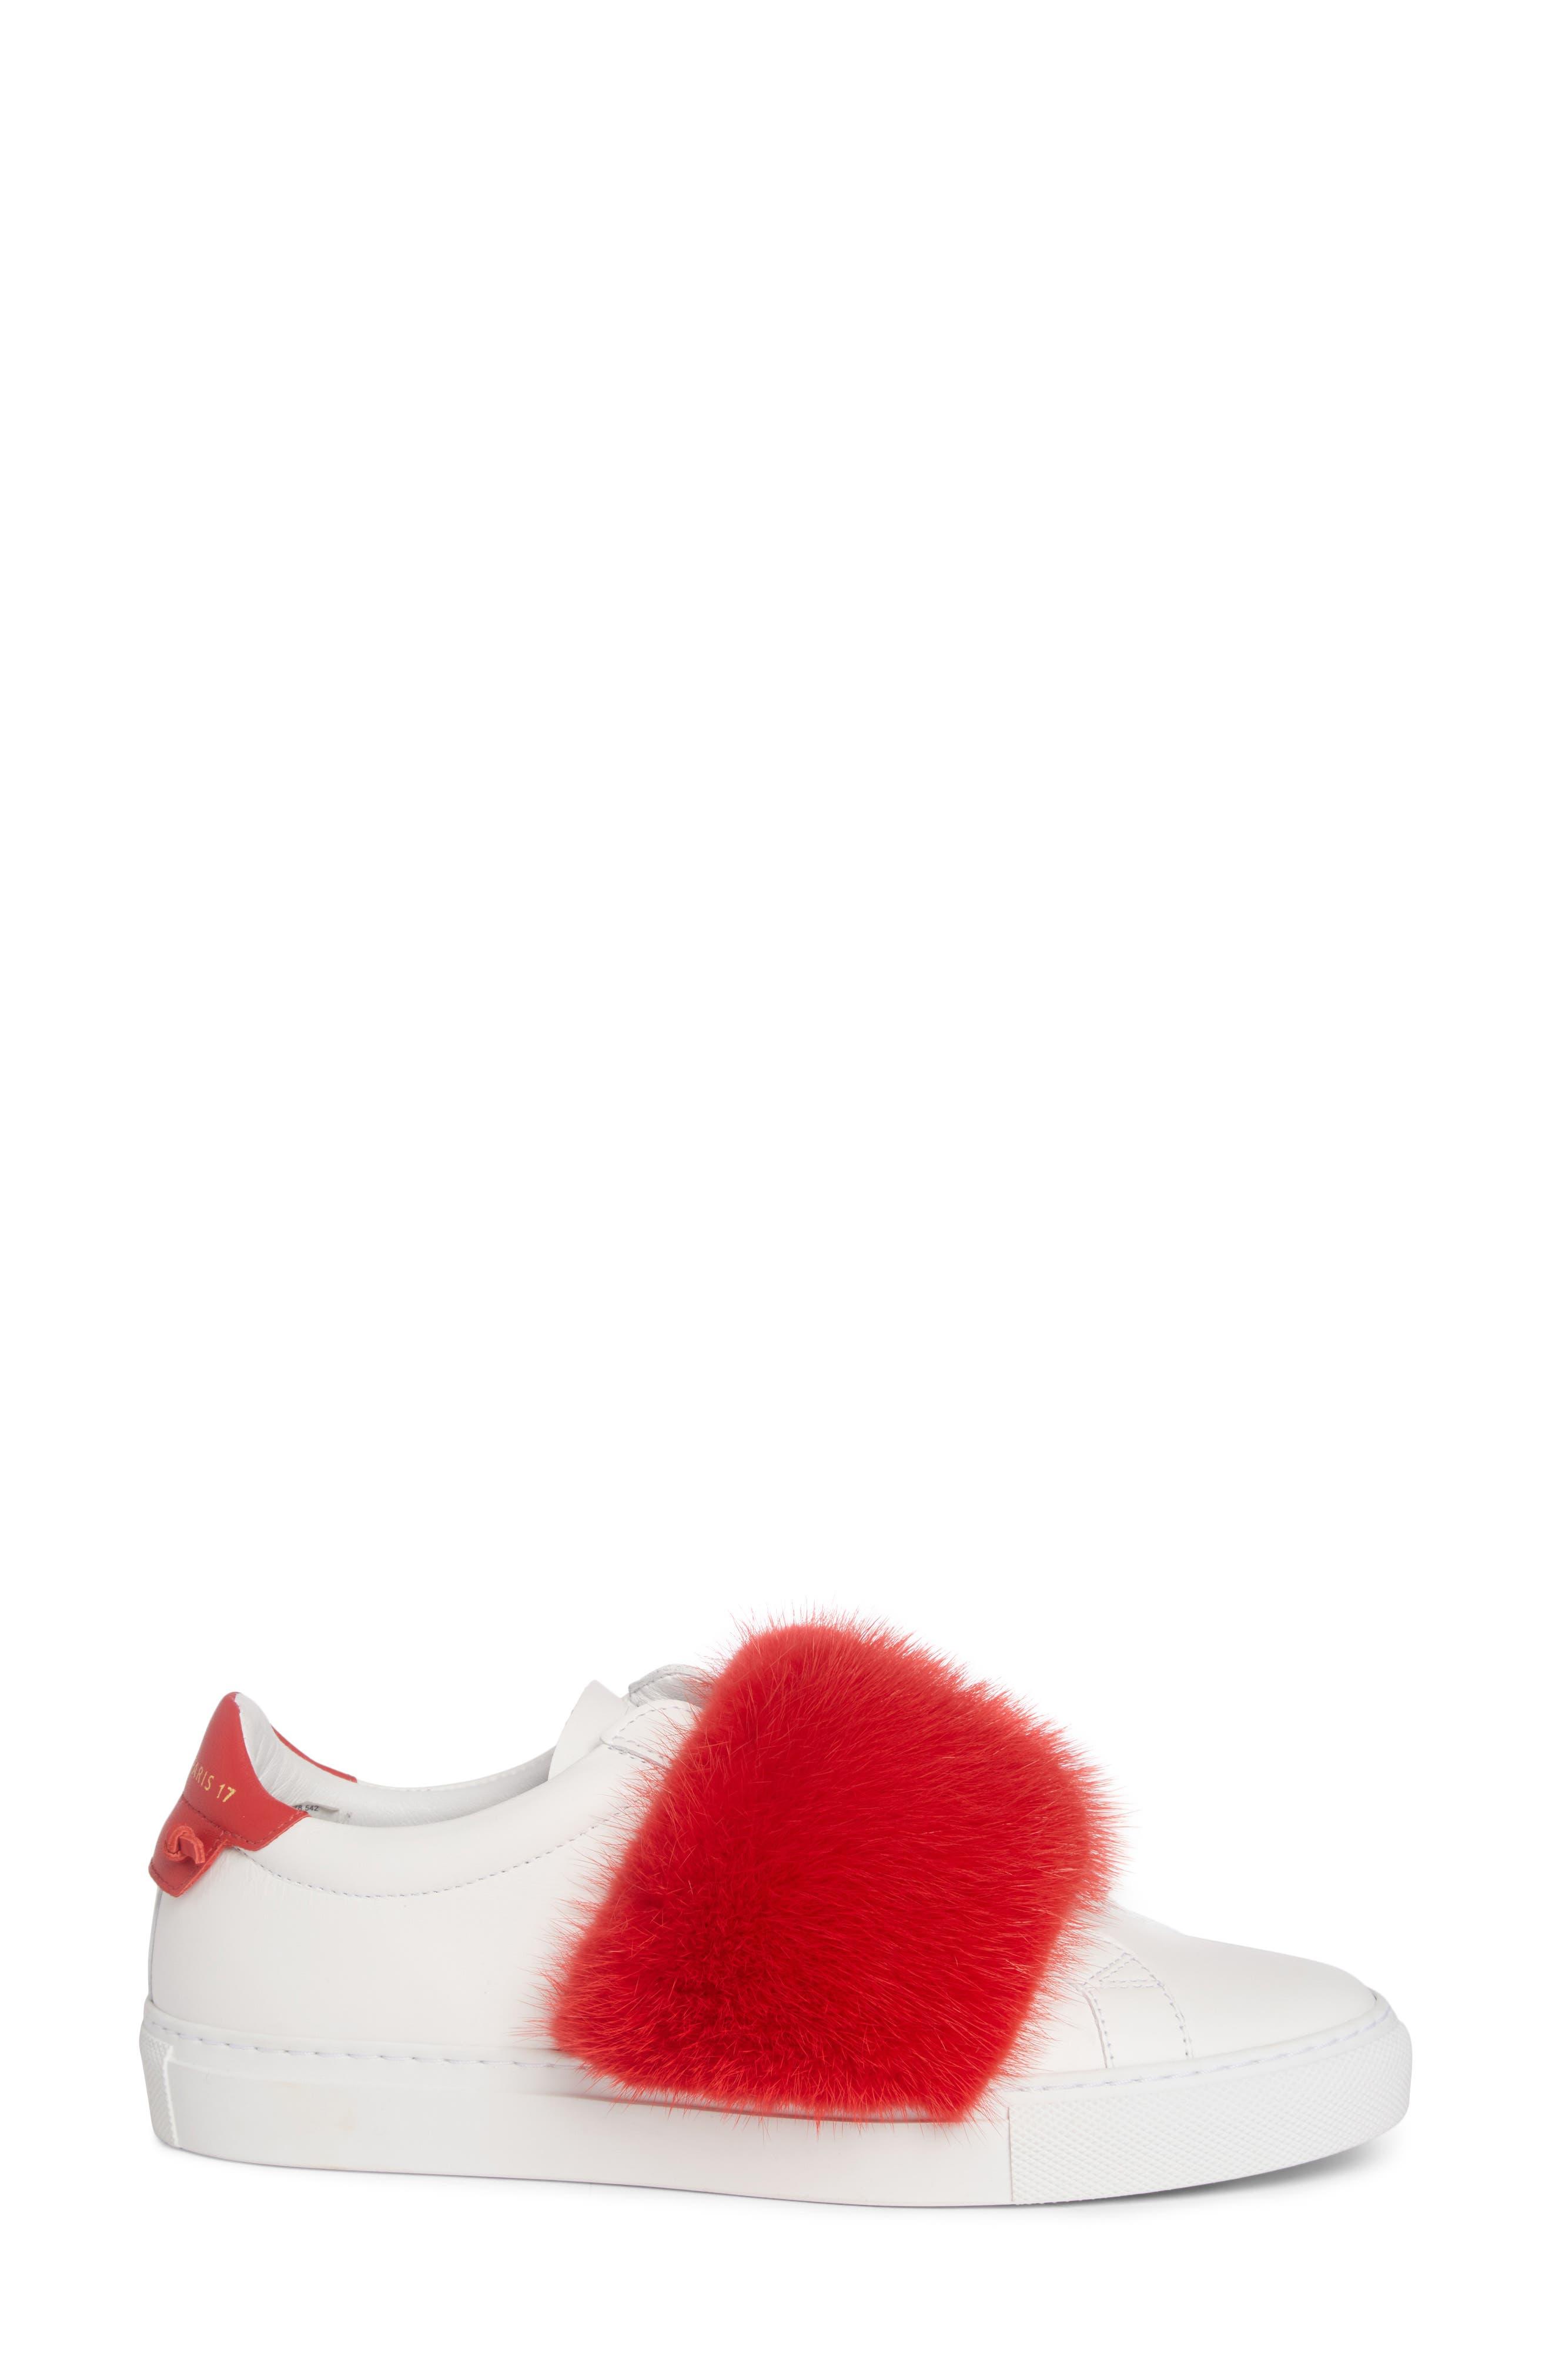 Urban Street Slip-On Sneaker with Genuine Mink Fur Trim,                             Alternate thumbnail 11, color,